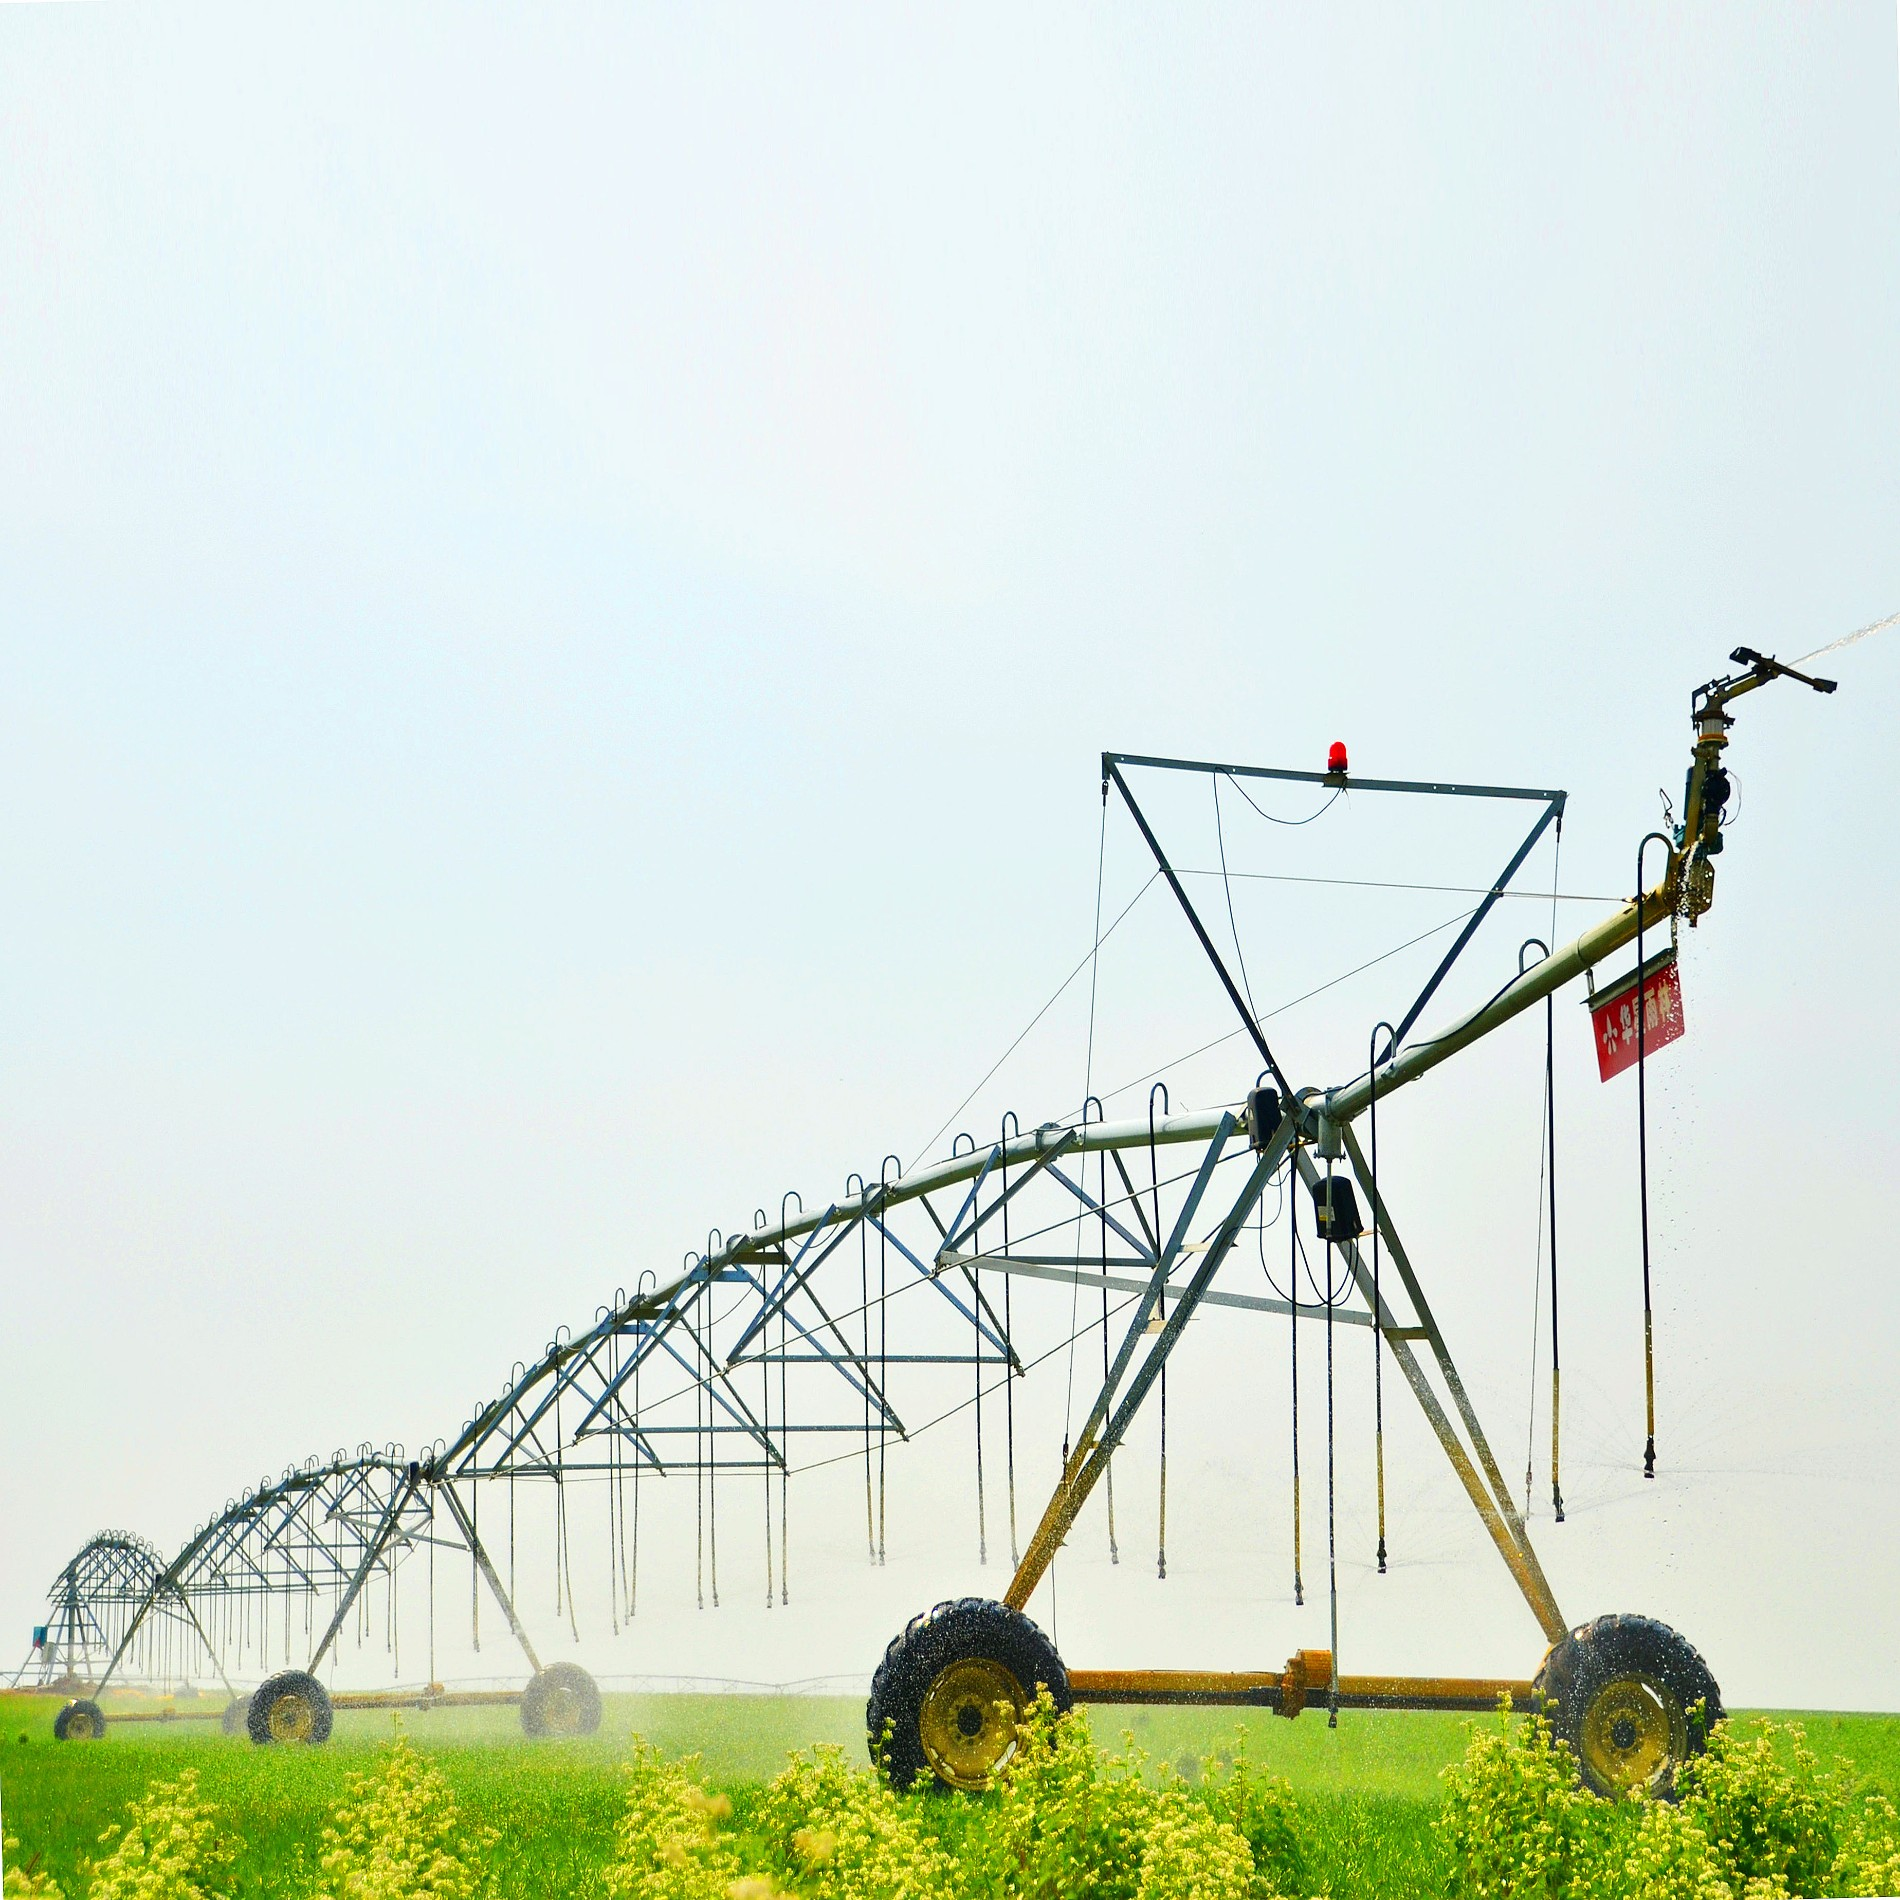 Suppliers High quality irrigation pivot machine Manufacturers, Suppliers High quality irrigation pivot machine Factory, Supply Suppliers High quality irrigation pivot machine